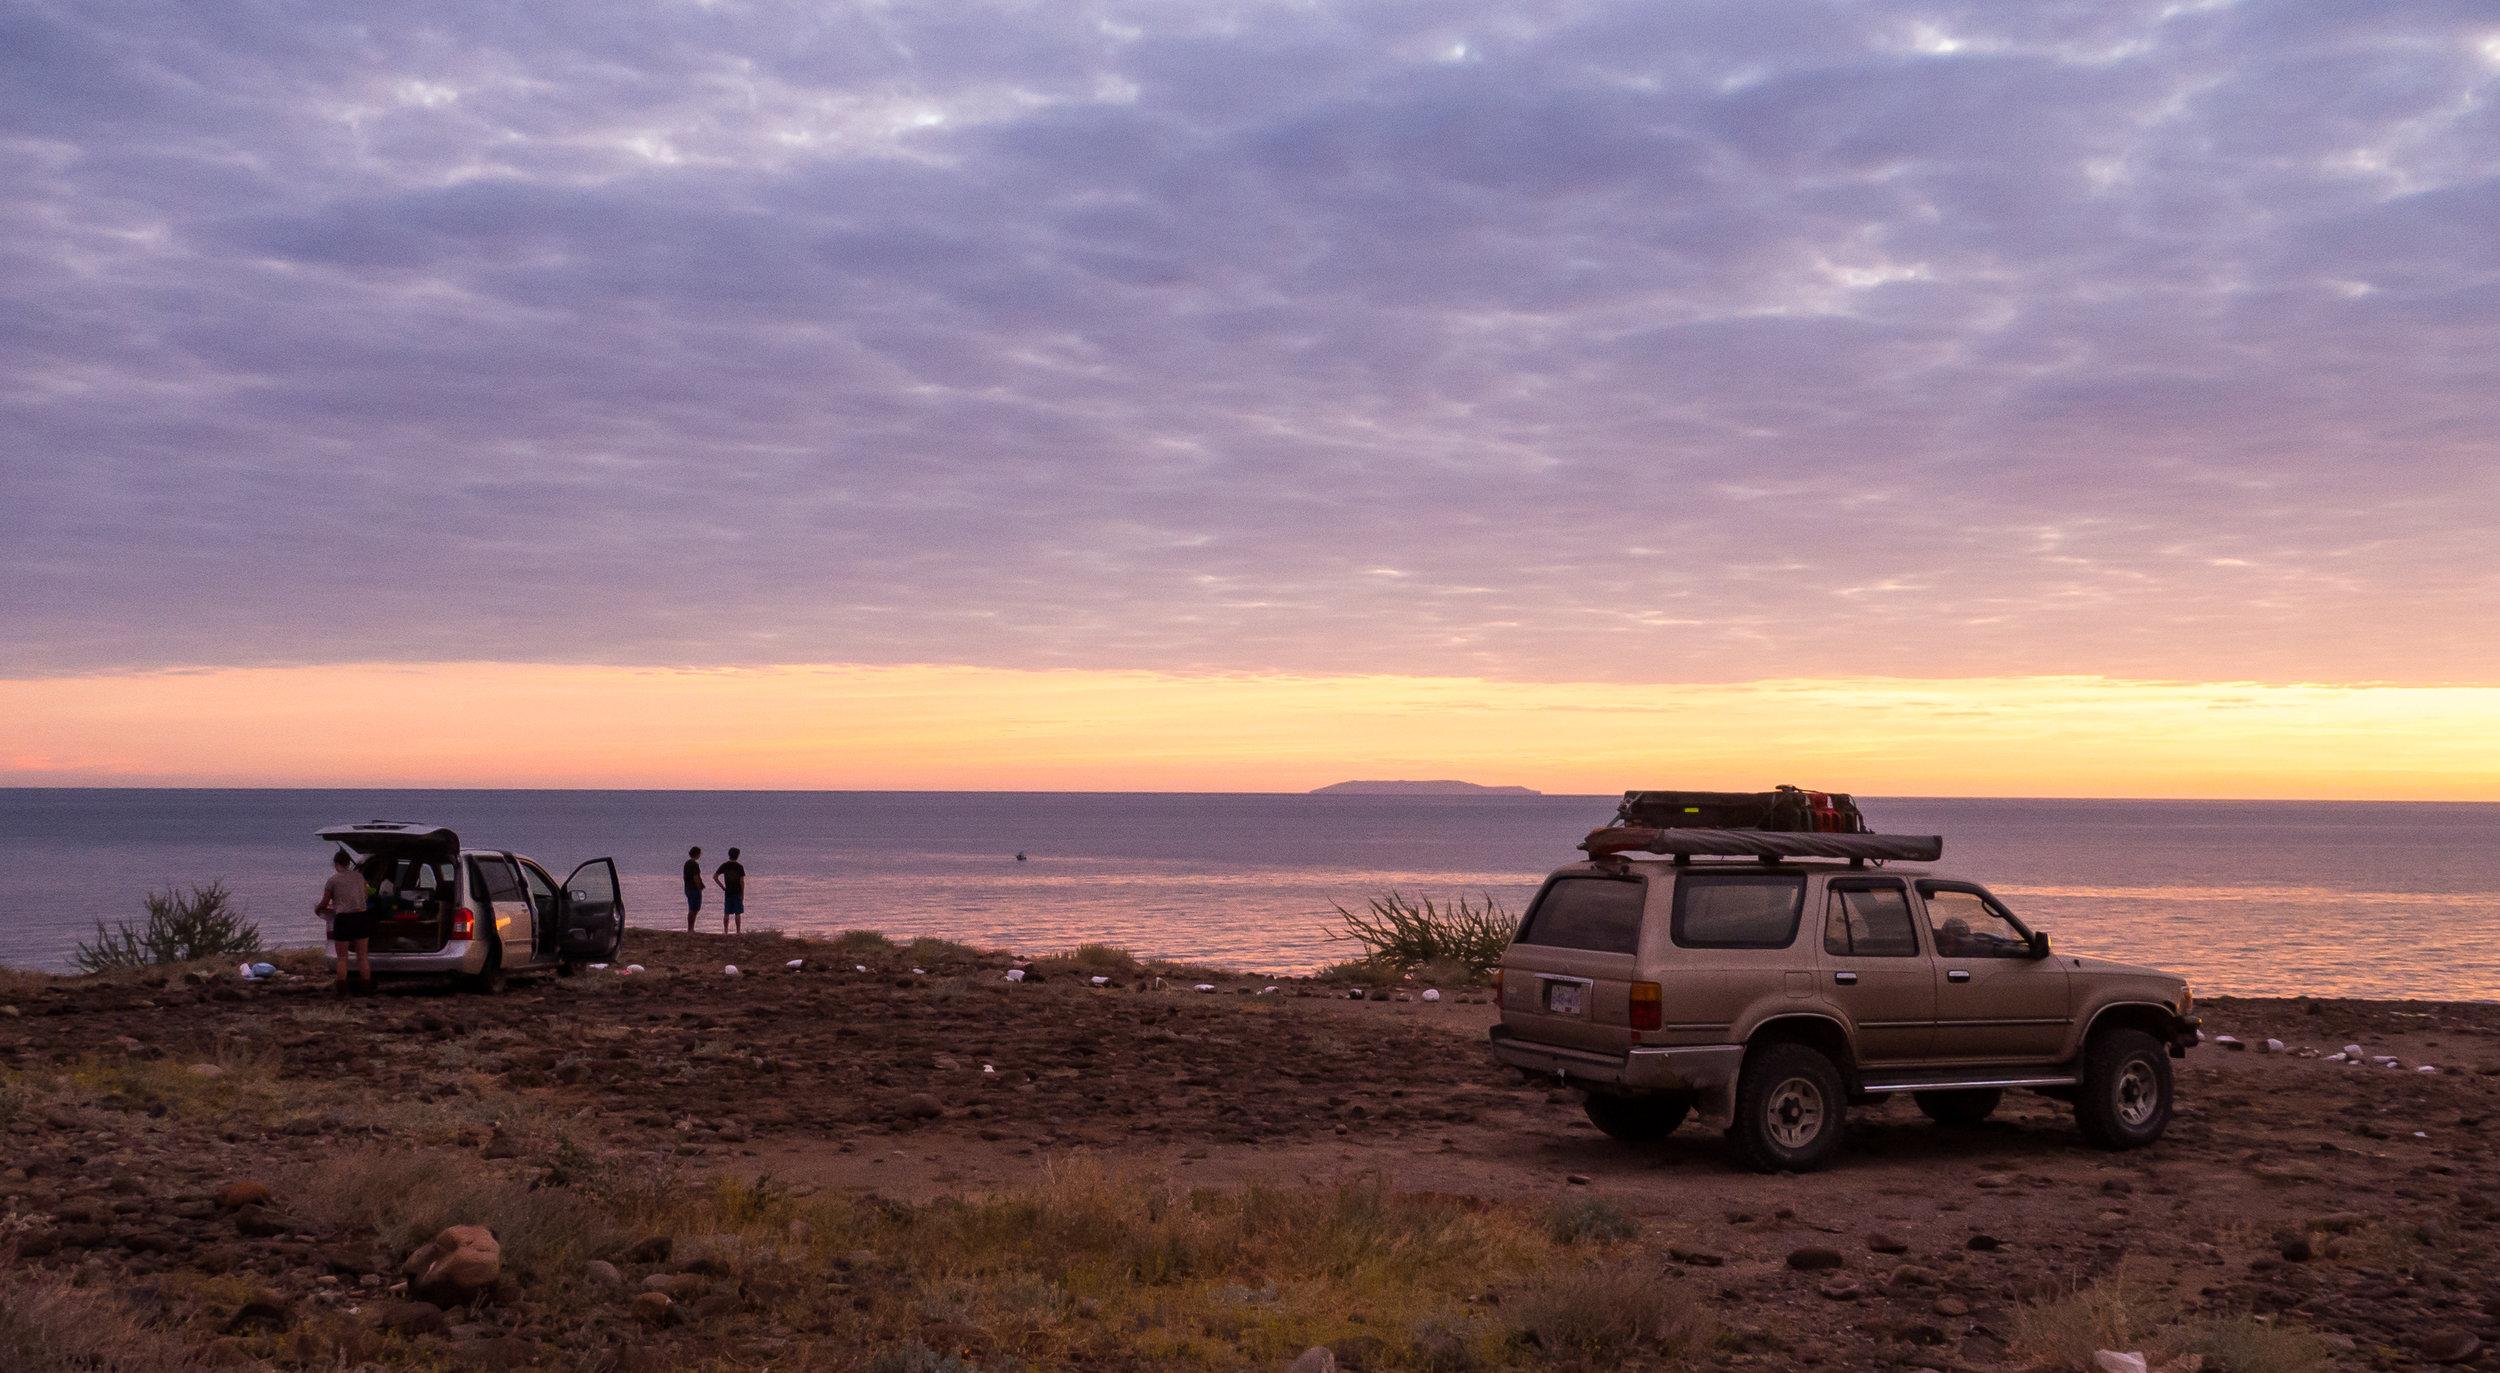 Bonus Photo: Our camp spot near Santa Rosalía. Photo Credit:  Danielle Seeliger .